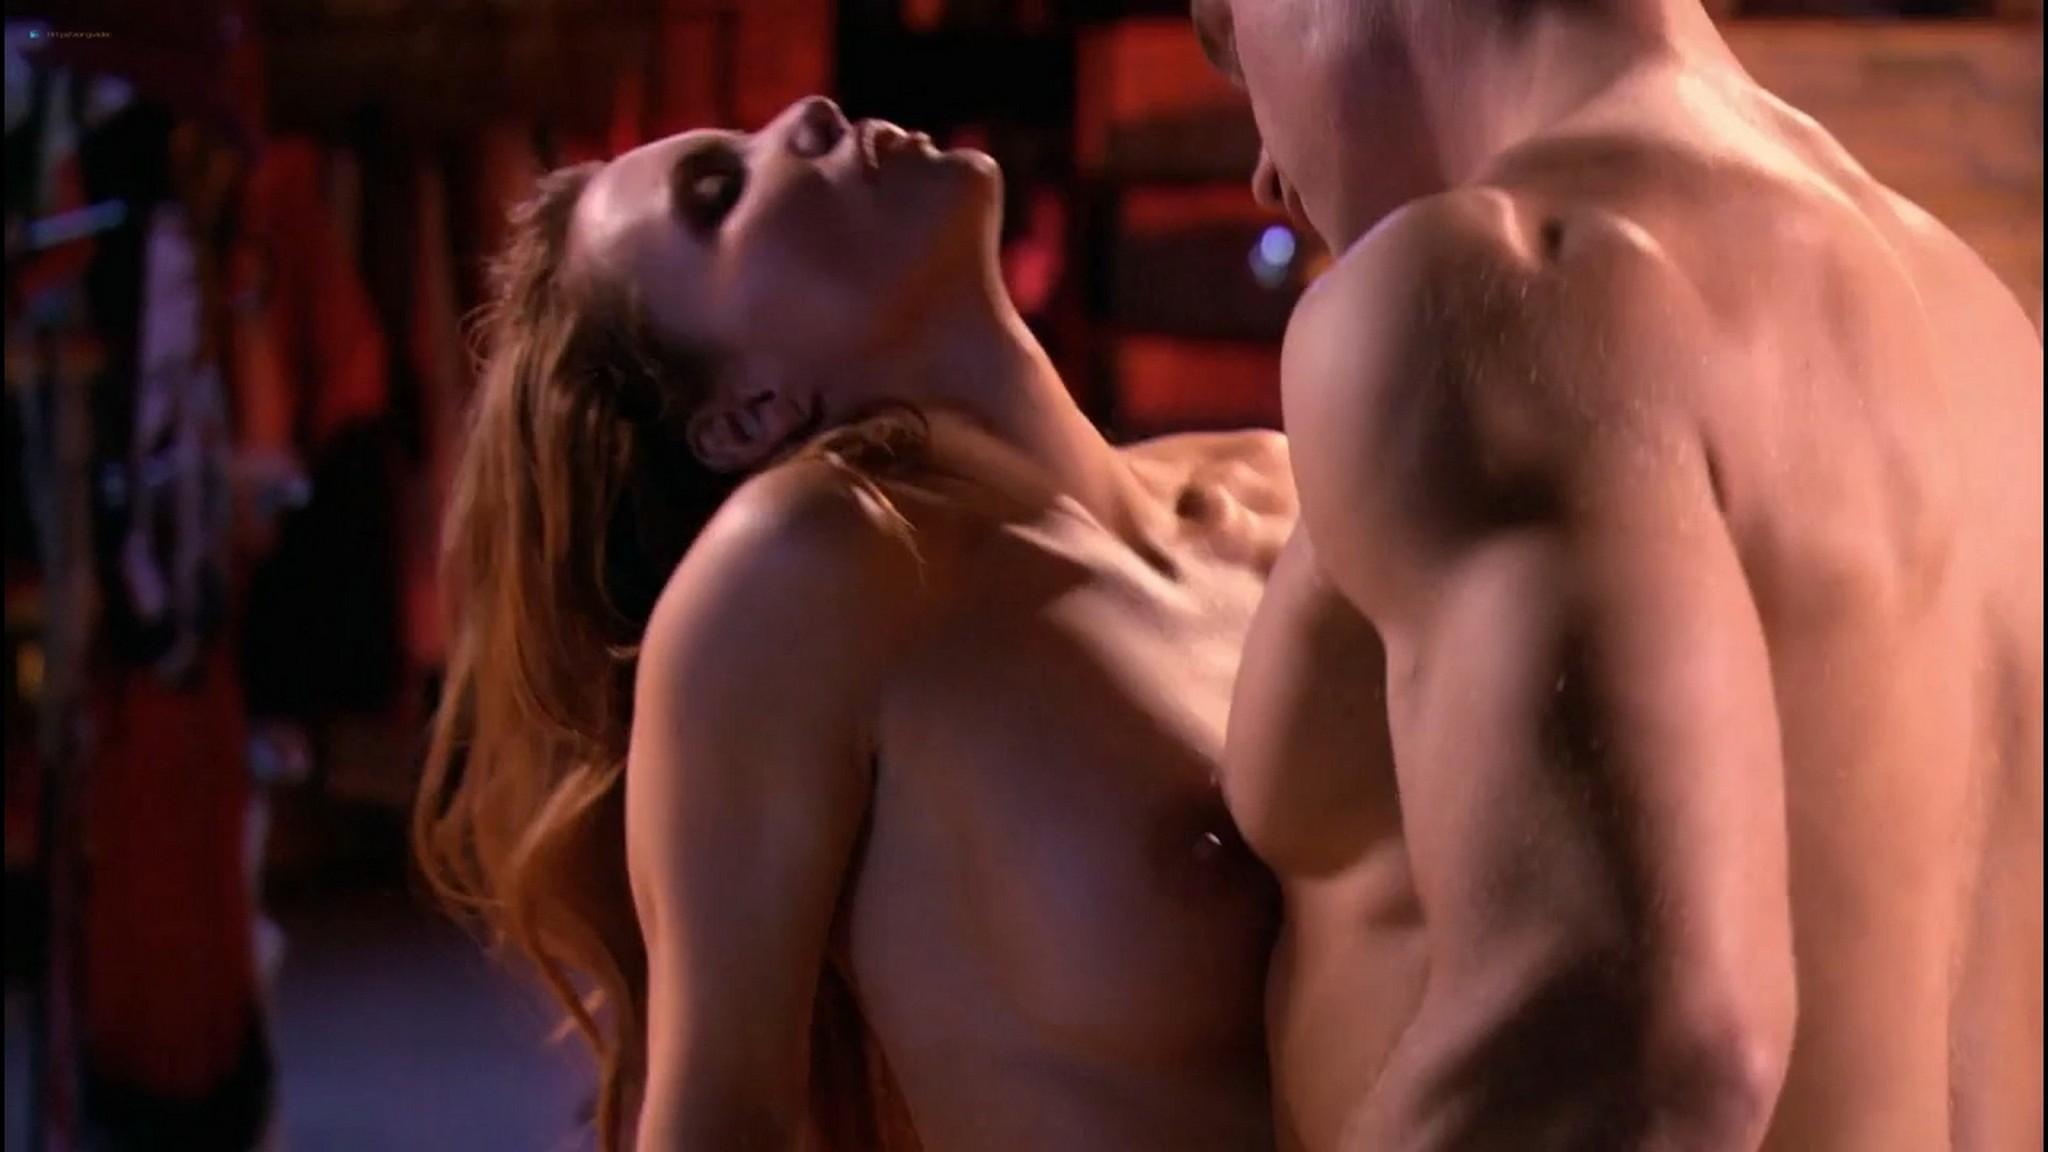 Erin Brown nude sex, Jennifer Korbin, Denise Cobar all nude hot sex - Lingerie (2009) s1e6 HD 720p